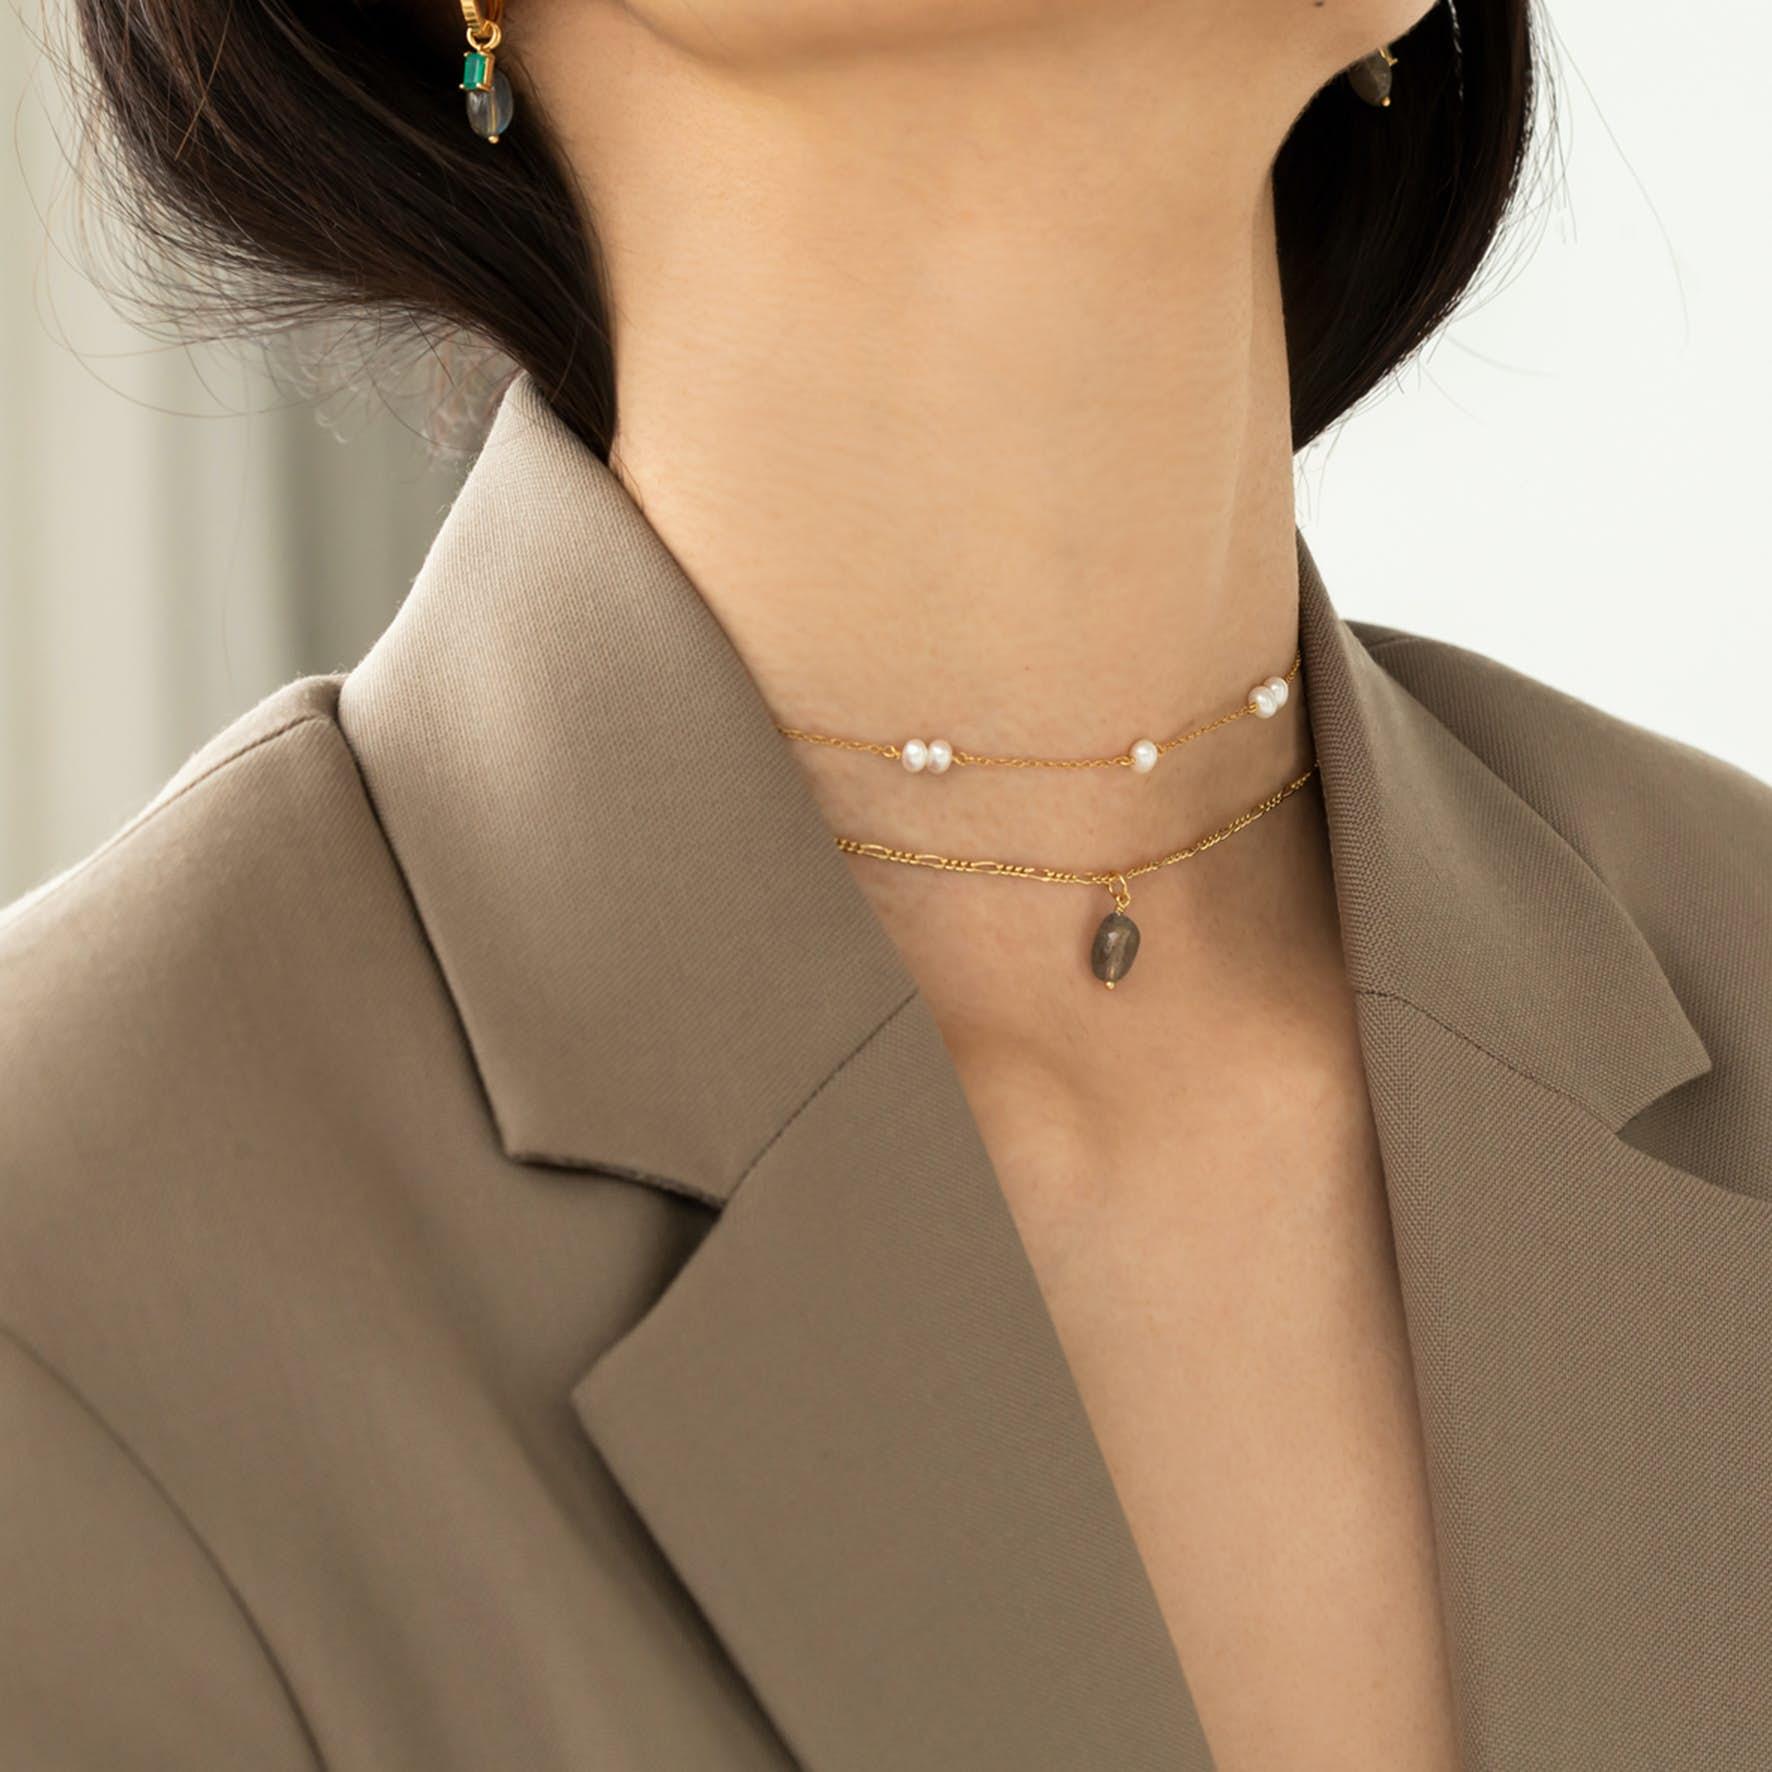 Archieve Pendant Confidence von Carré in Vergoldet-Silber Sterling 925